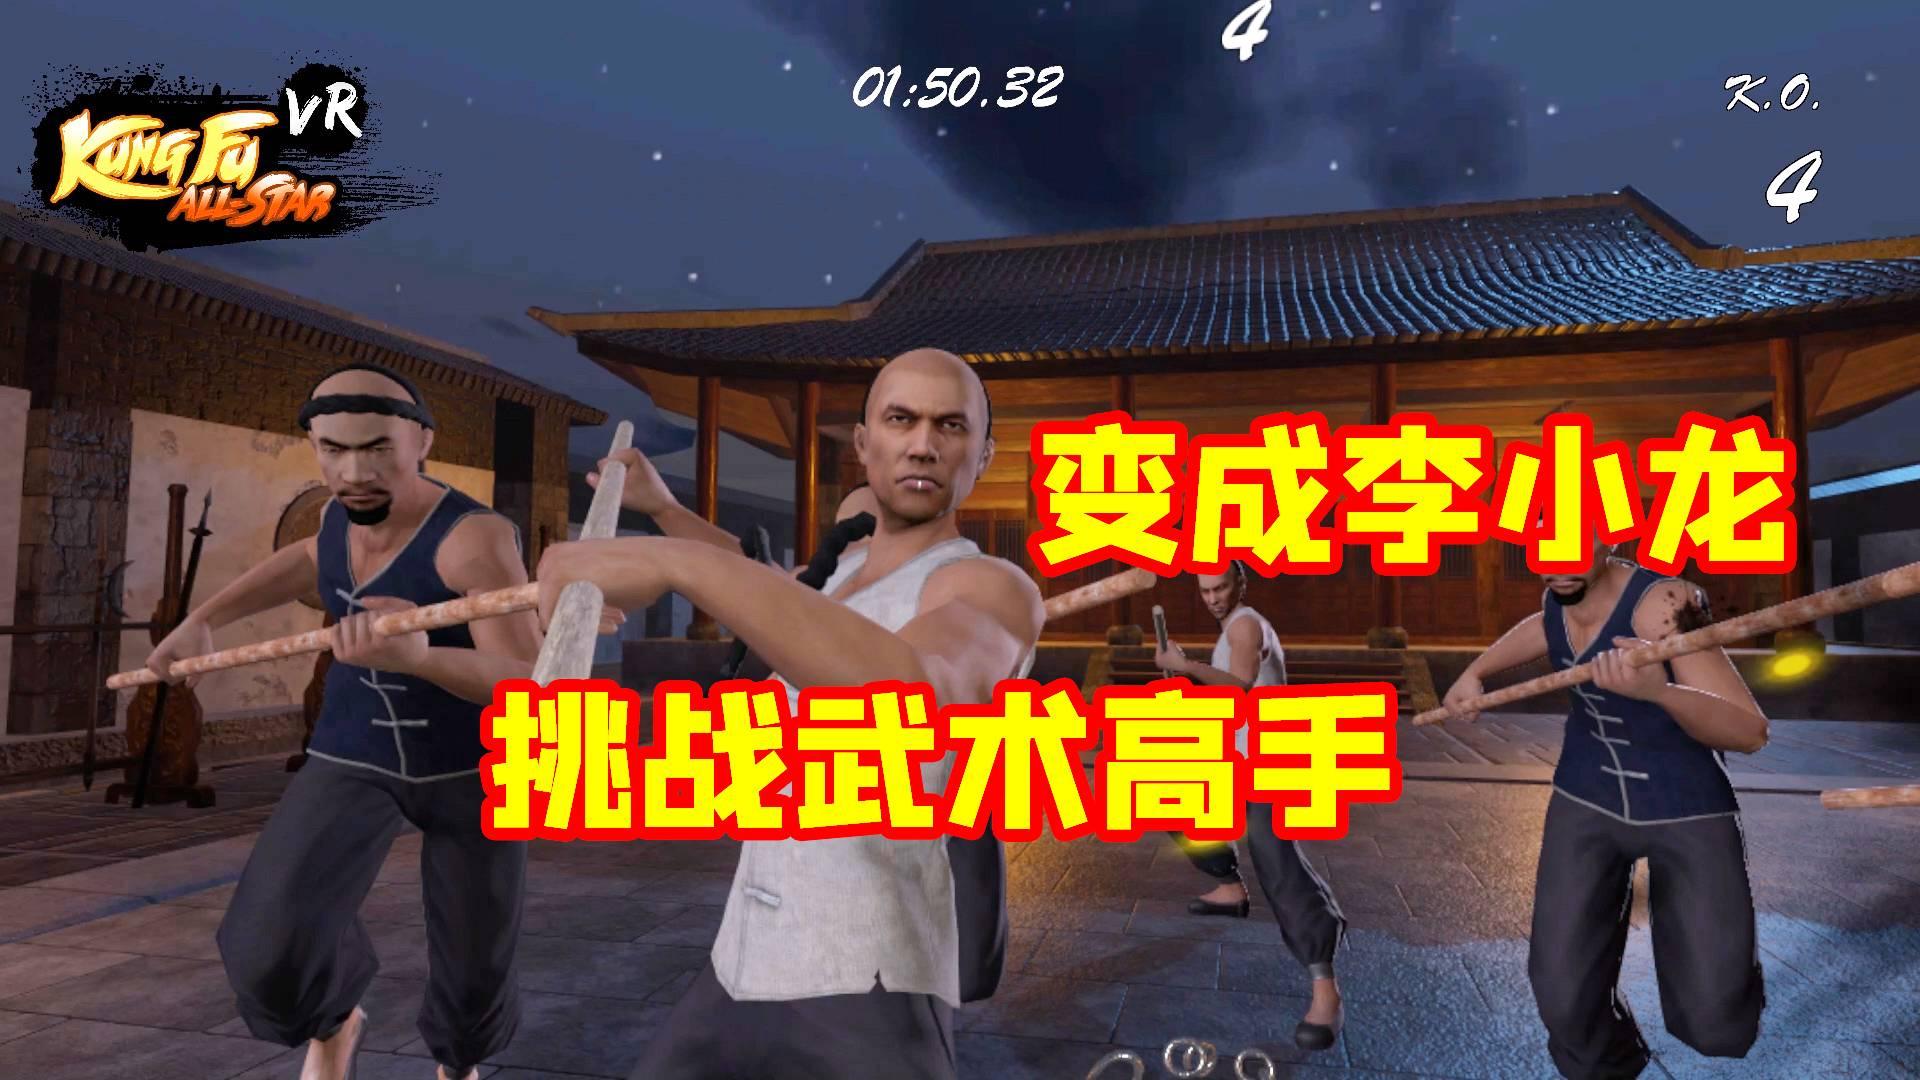 VR版游戏:我变成李小龙,挑战中国武术高手,能成功吗?